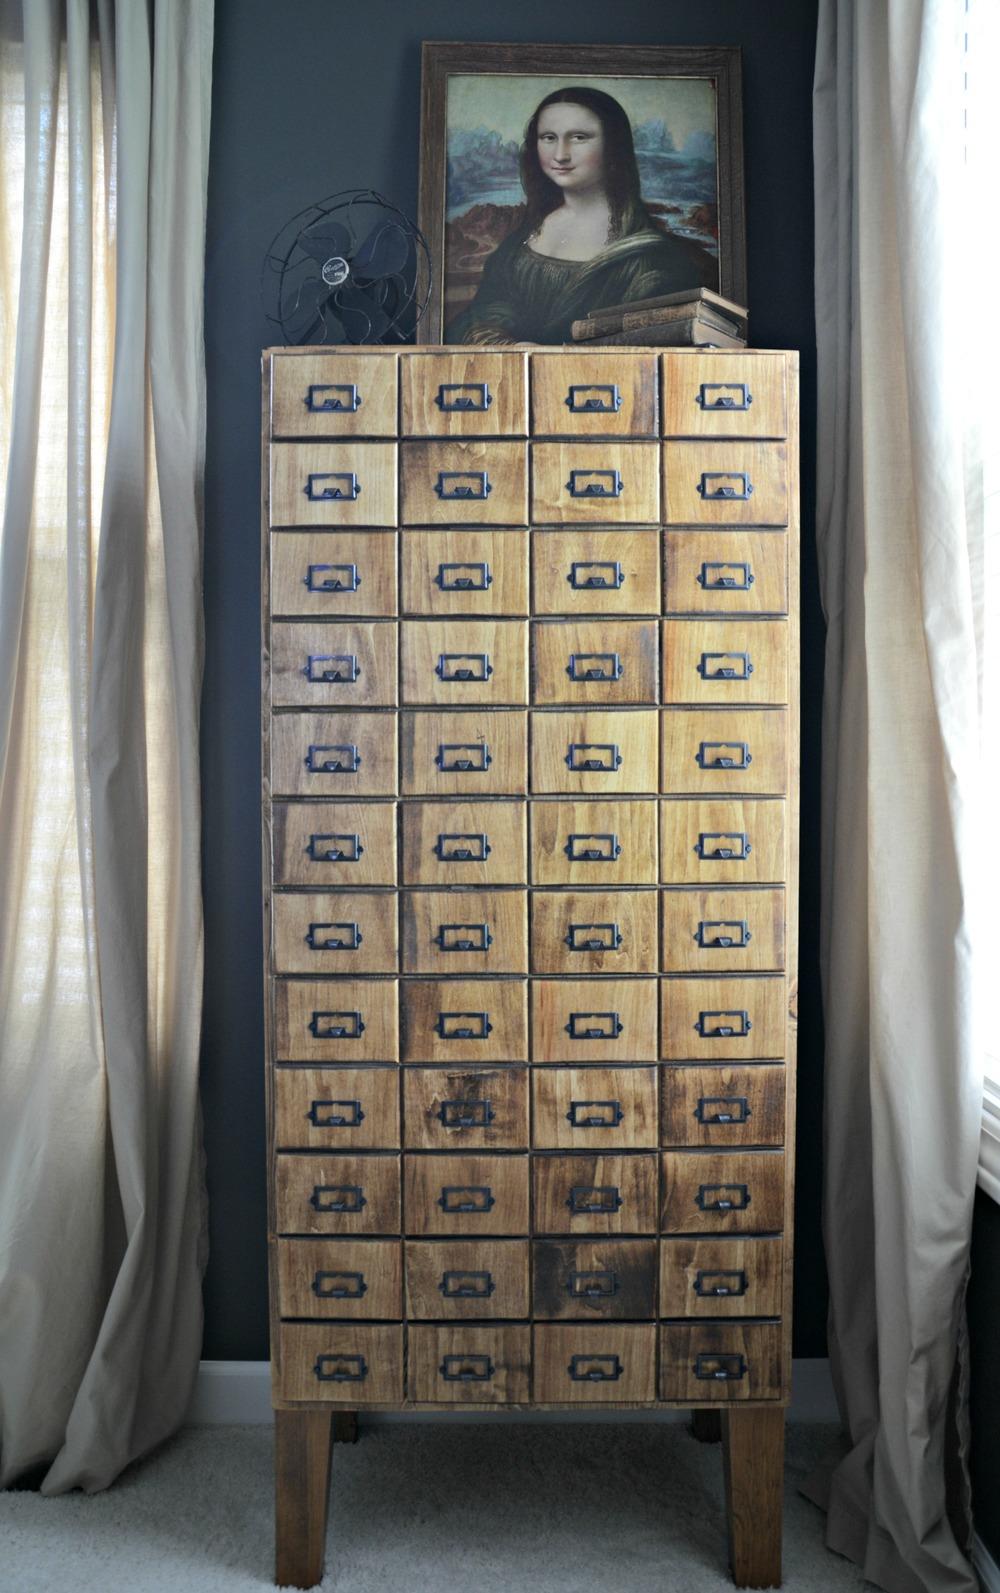 DIY Card Catalog Cabinet Tutorial | Build your own card catalog!